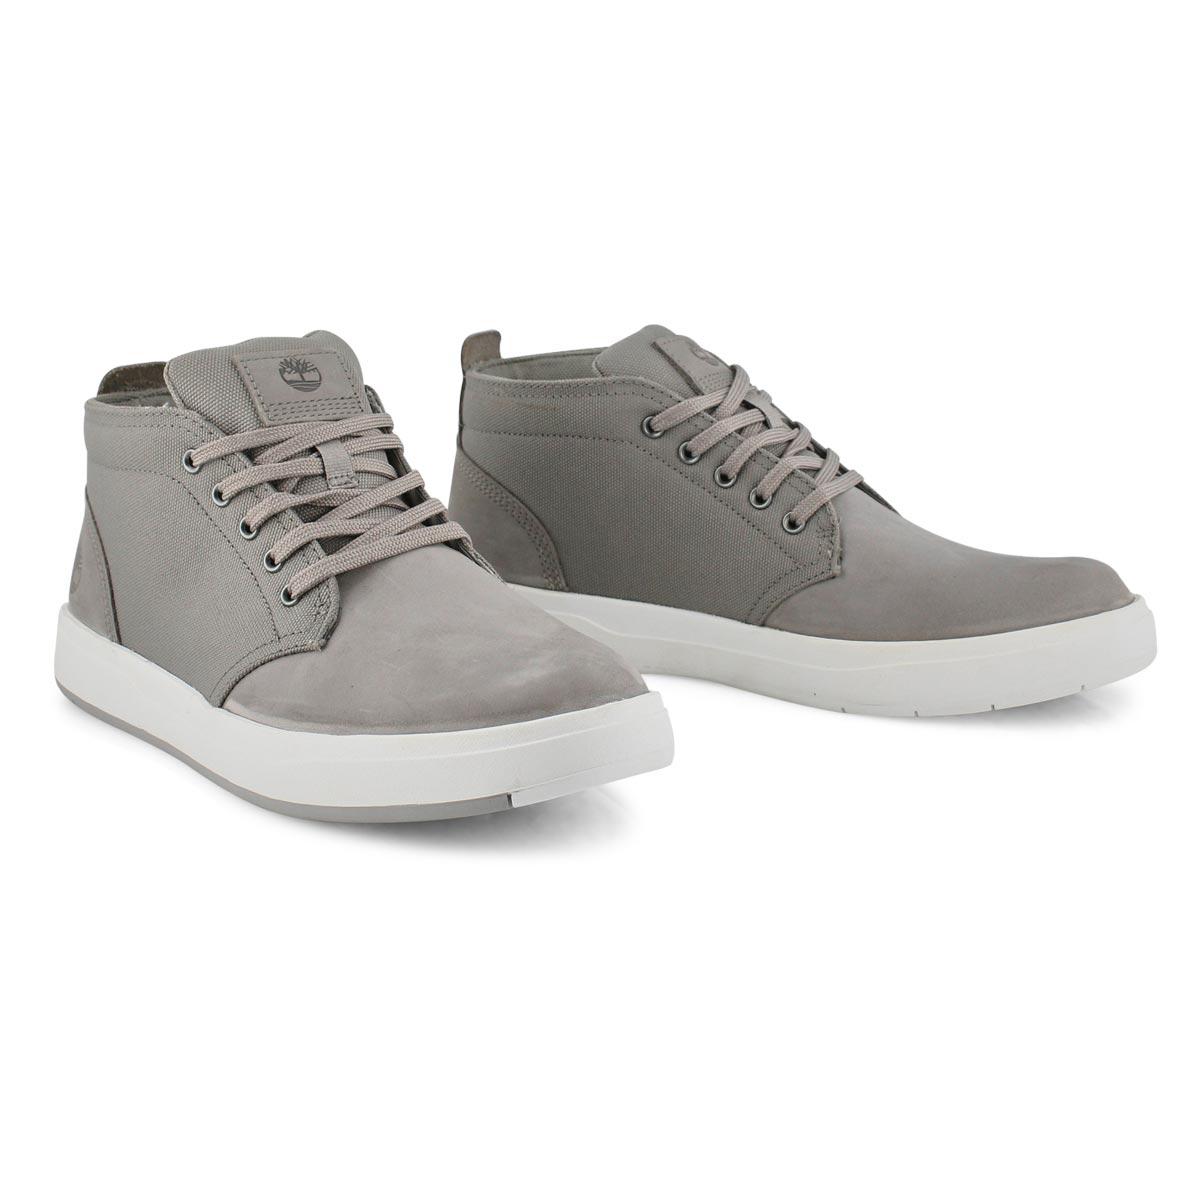 Men's DAVIS SQUARE grey chukka boots